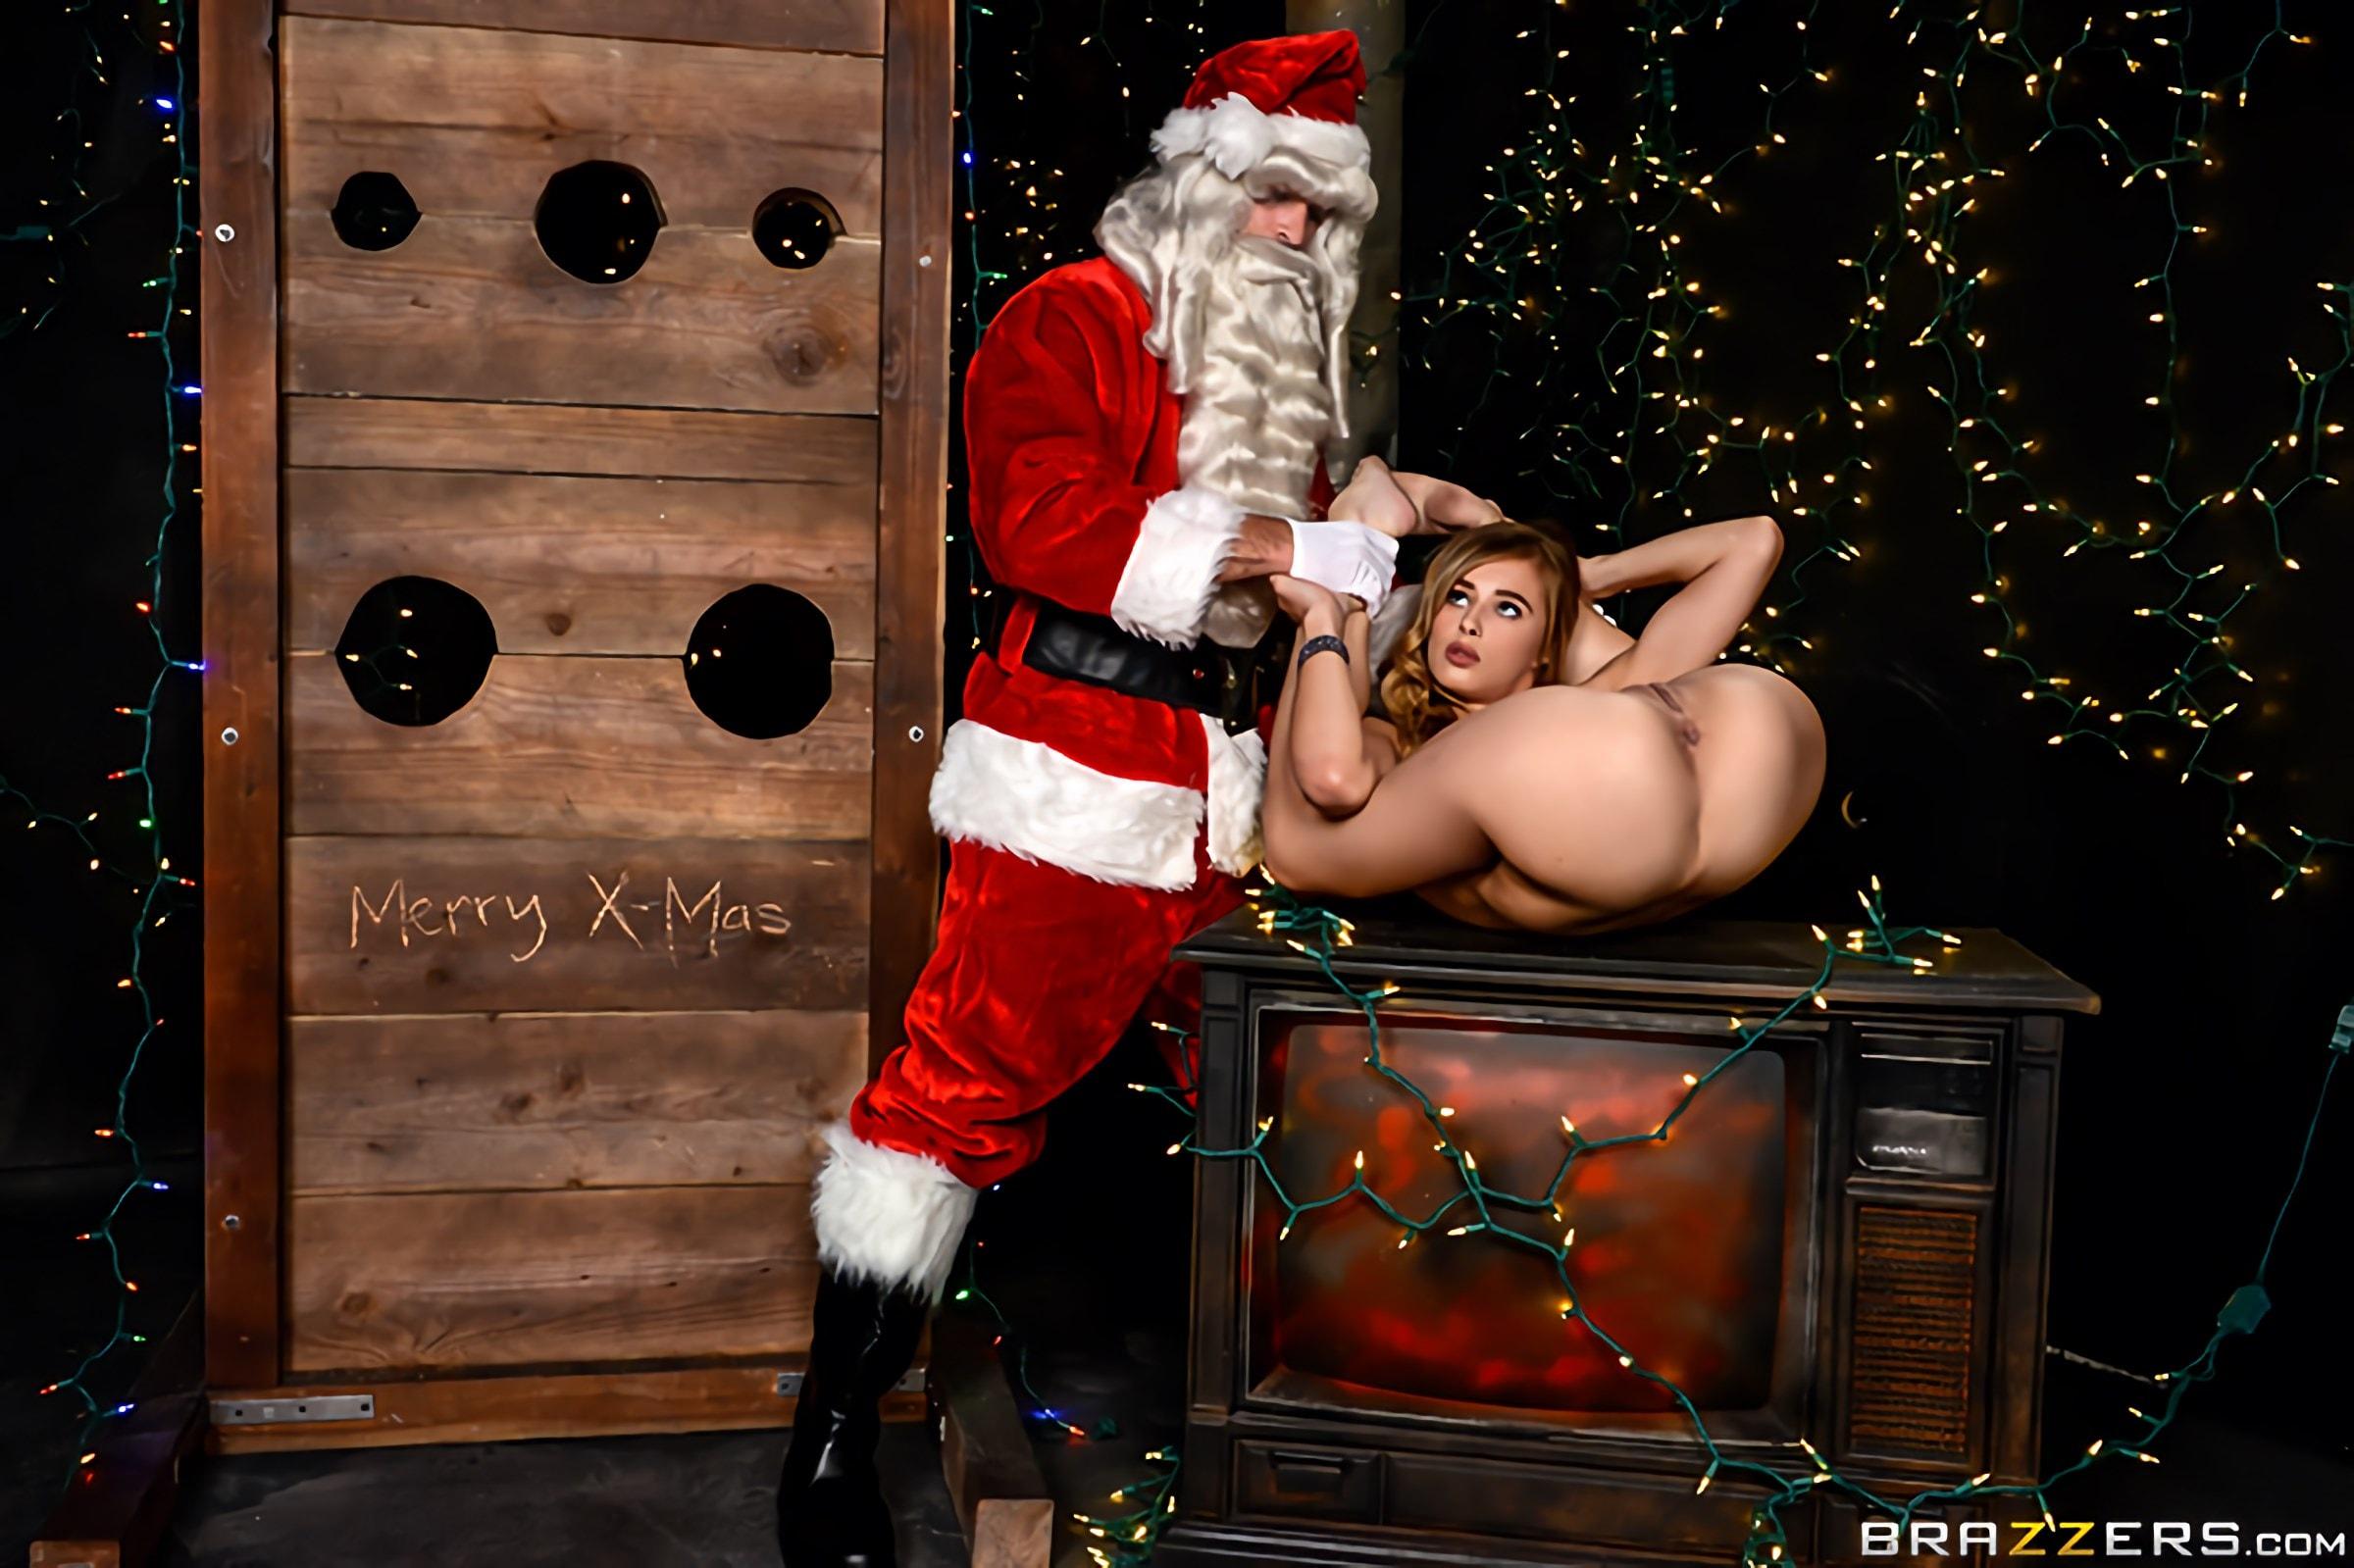 Brazzers 'A Brazzers Christmas Special - Part 3' starring Jillian Janson (Photo 1)